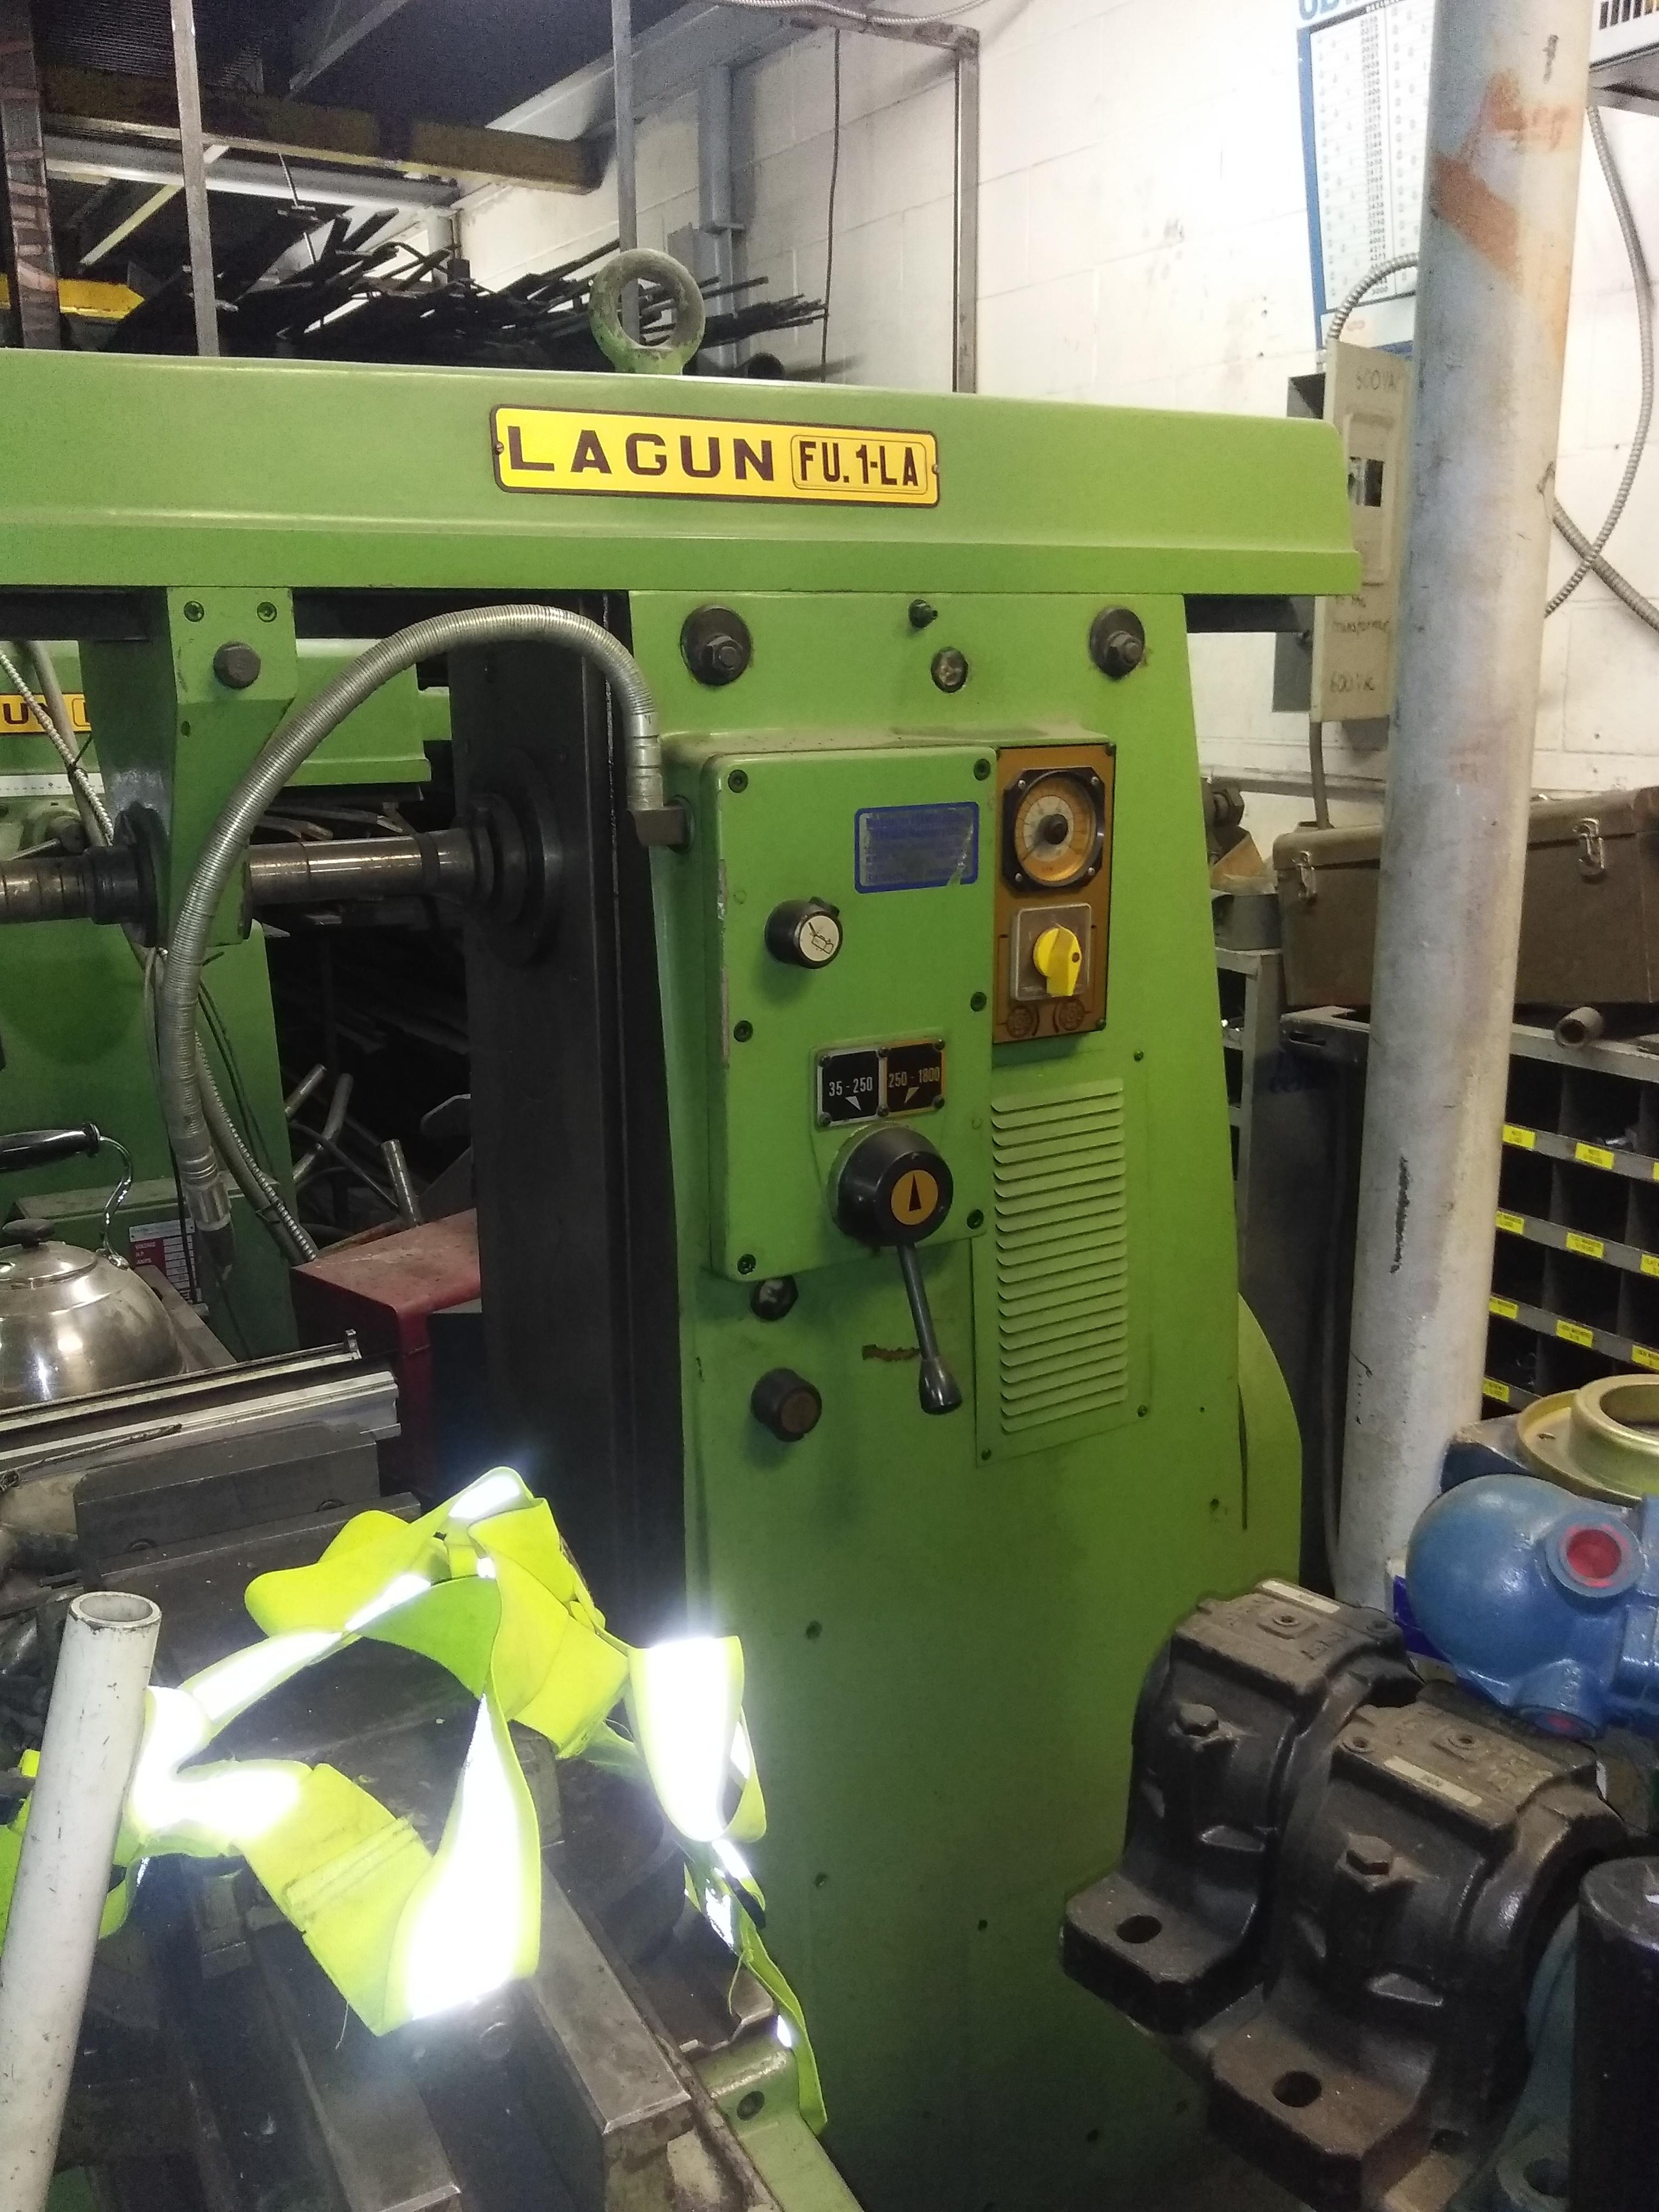 Lagun FU1 LA - Horizontal Milling  Machine   Quantity :1  Cost: $3500